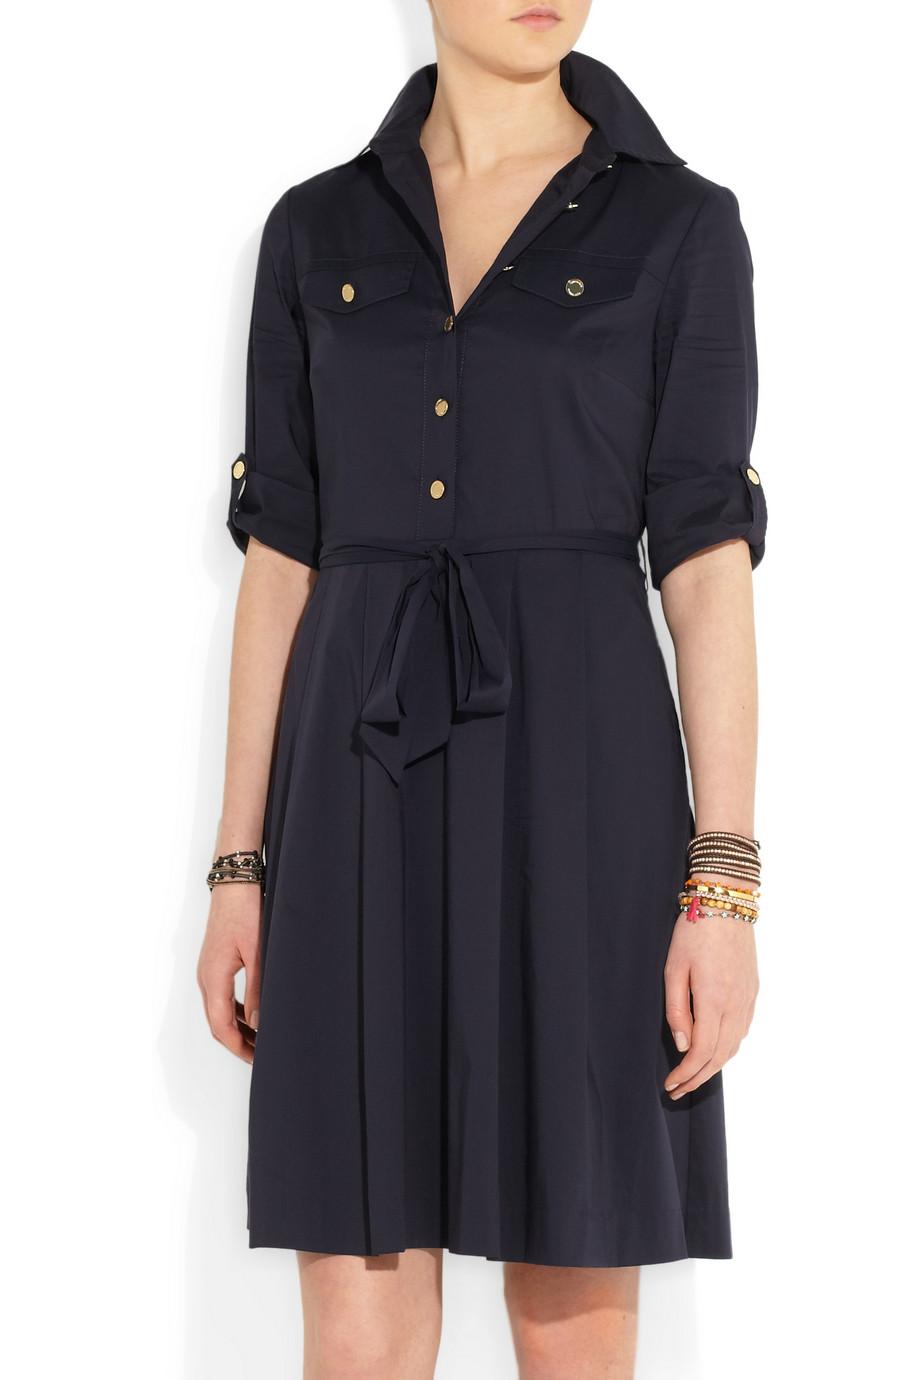 Tory burch blythe stretch cottonblend shirt dress in black for How to stretch a dress shirt